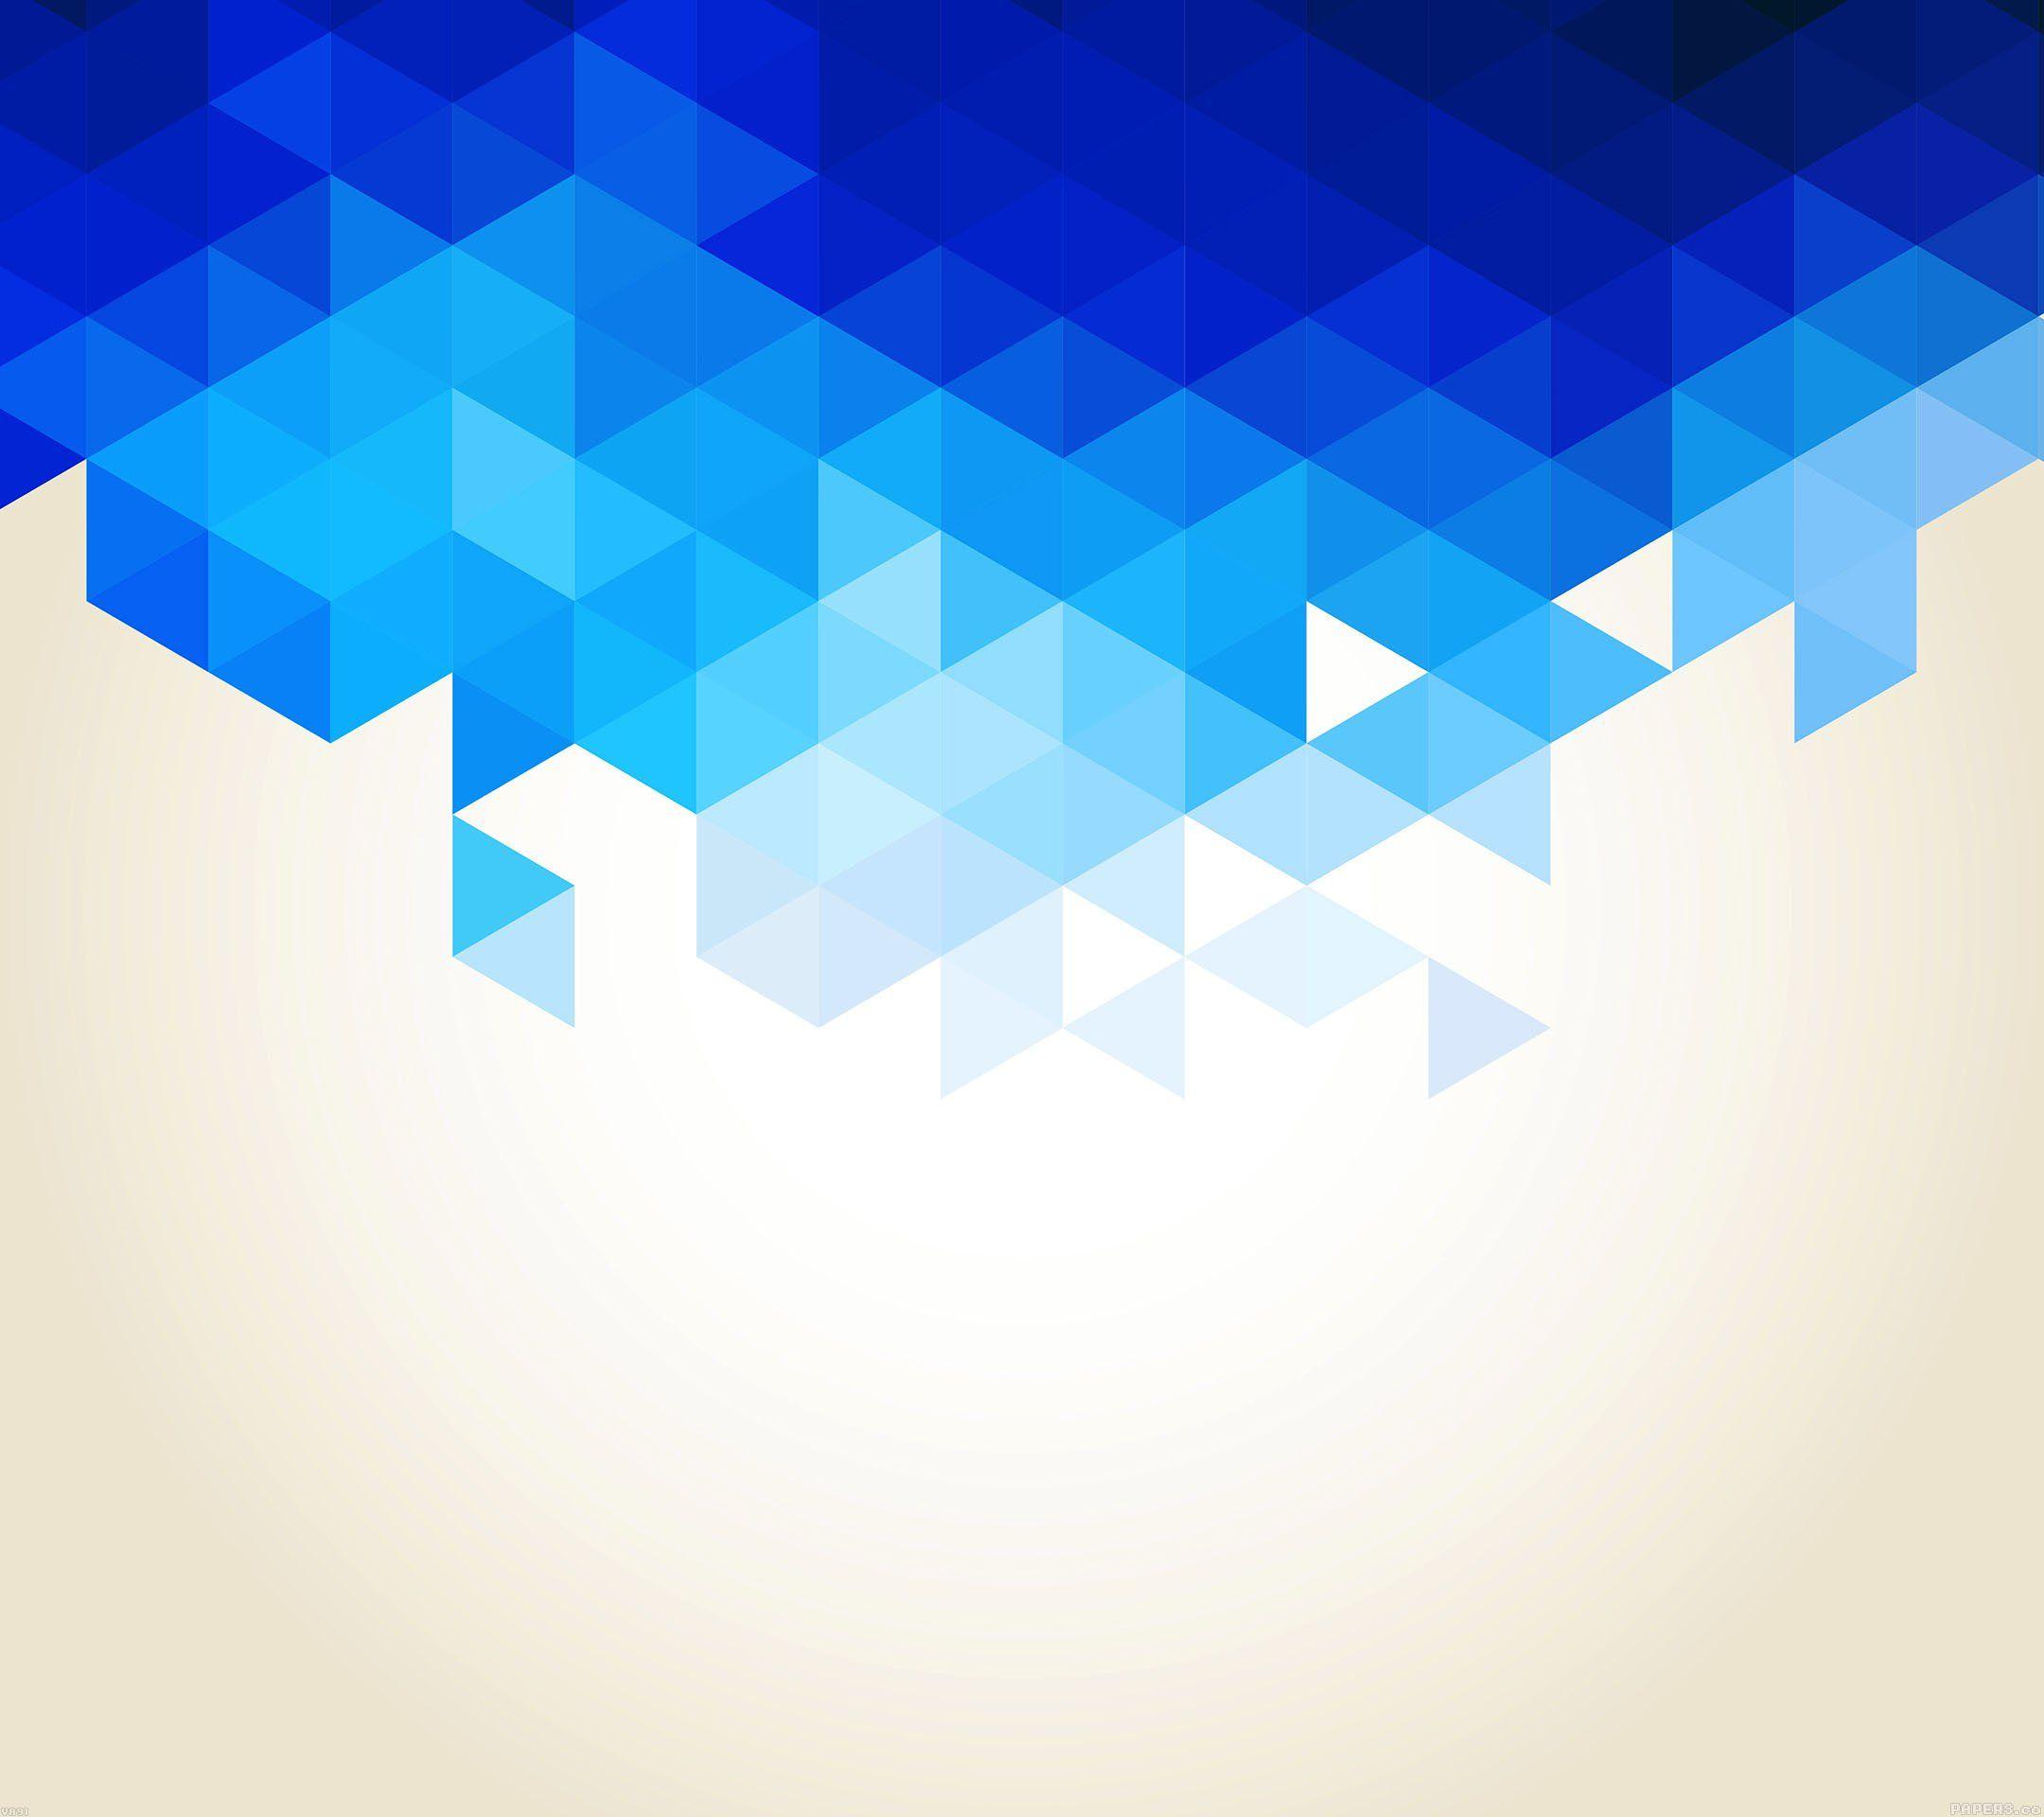 wallpaper-va91-wallpaper-triangle-fall-blue-pattern | Wallpaper and ...